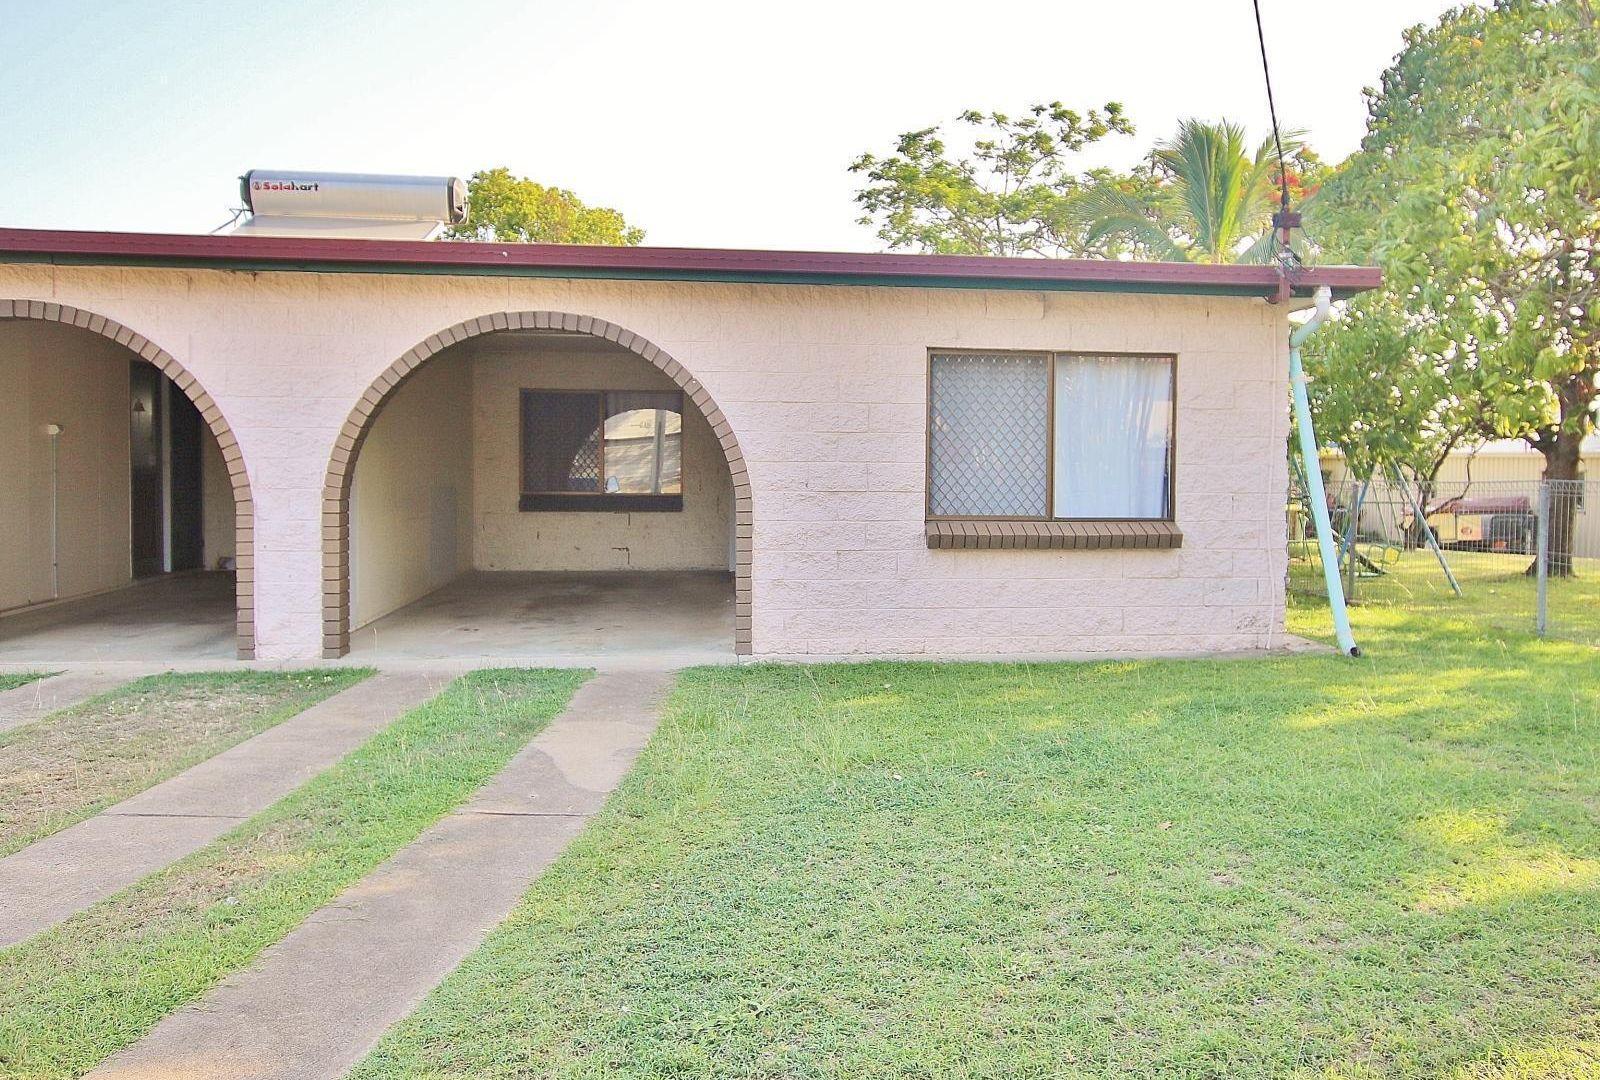 5/322 Warnock Street, Koongal QLD 4701, Image 5